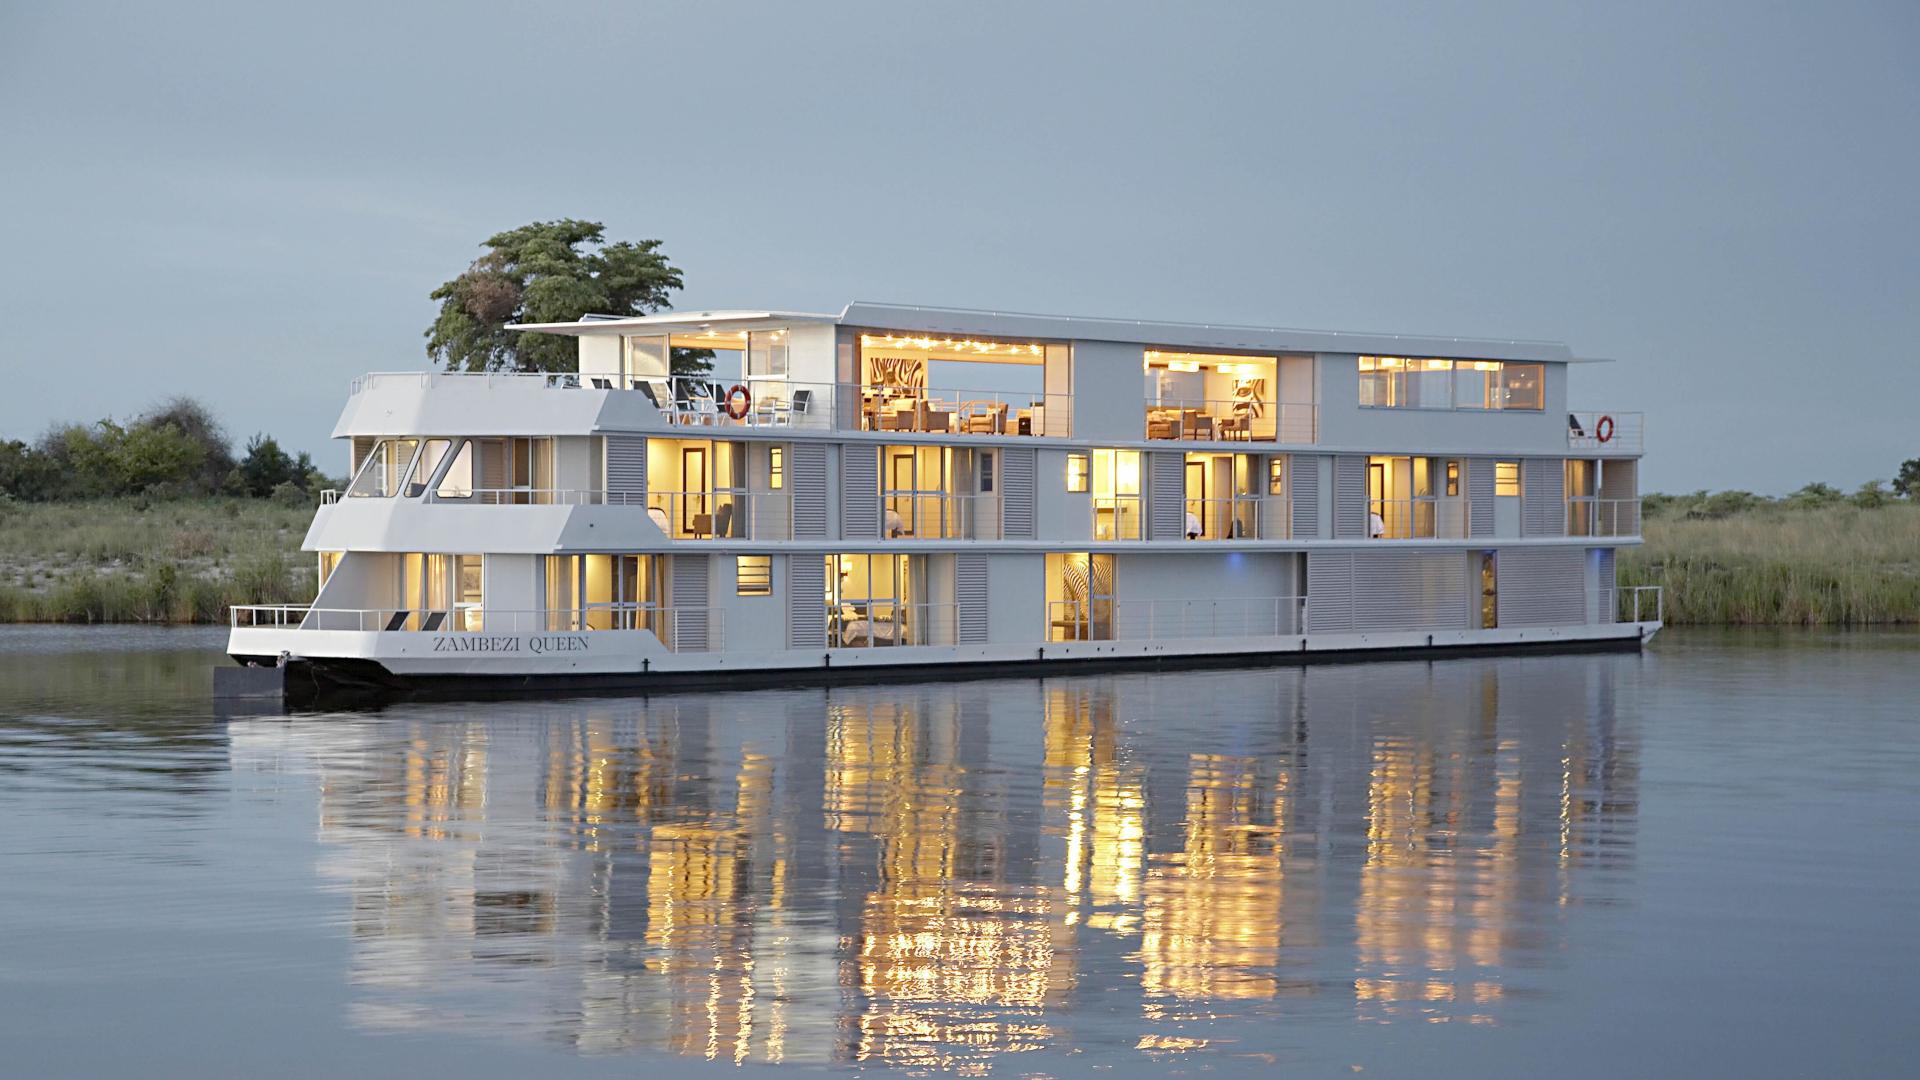 Zambezi Queen River Cruise Botswana Luxury Safari Boat